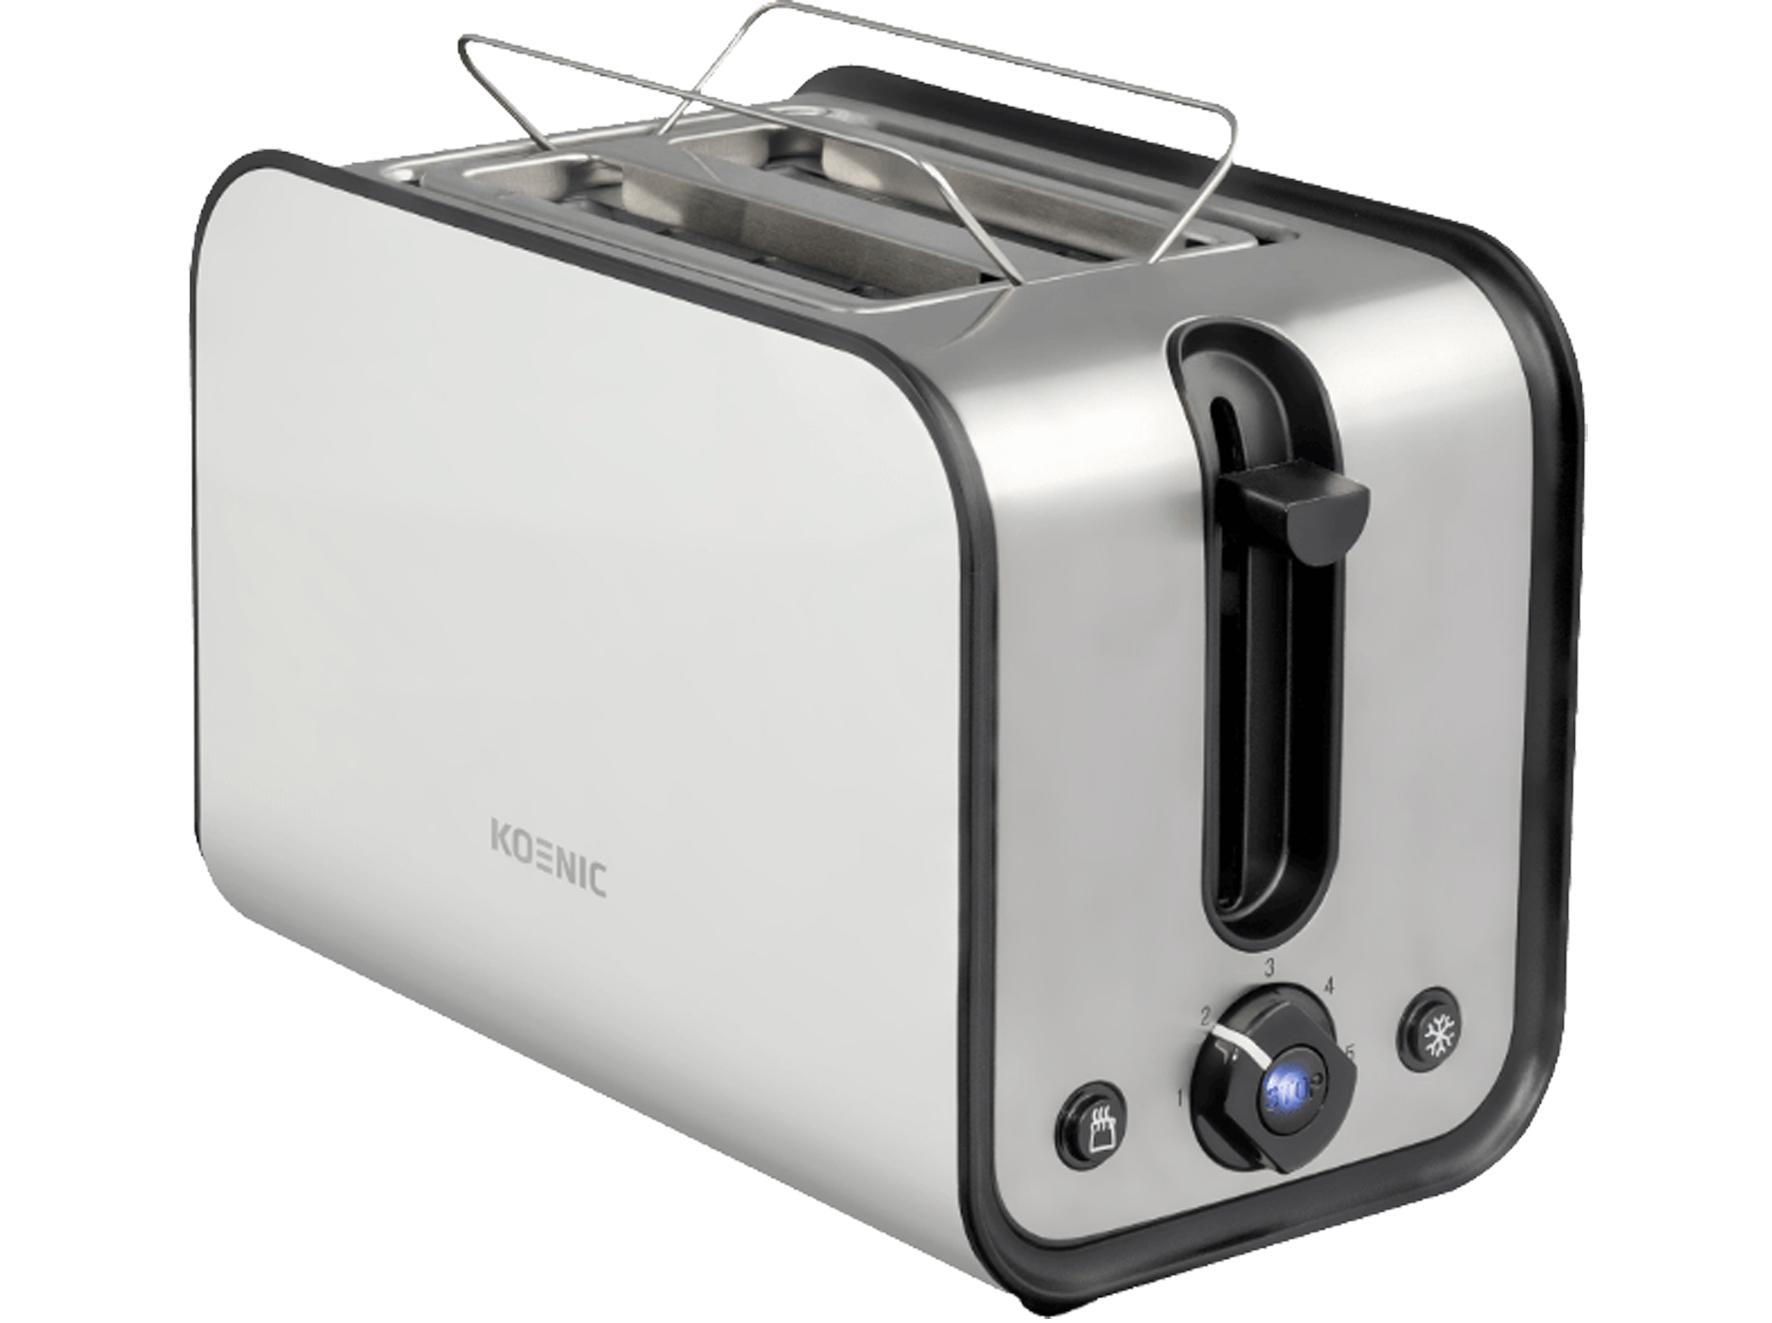 KOENIC Toaster KTO 2212